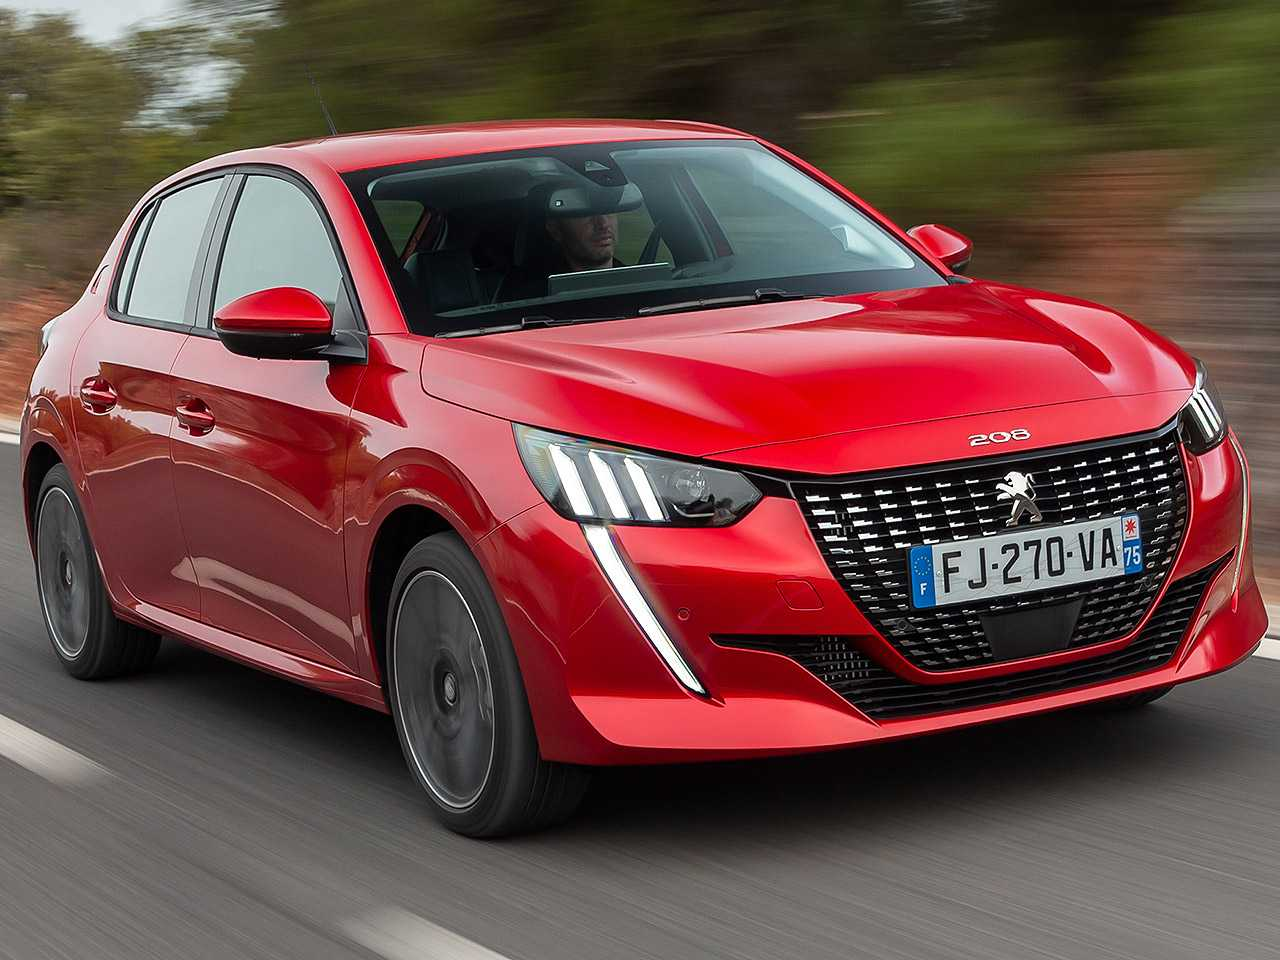 Detalhe do Peugeot 208 vendido na Europa